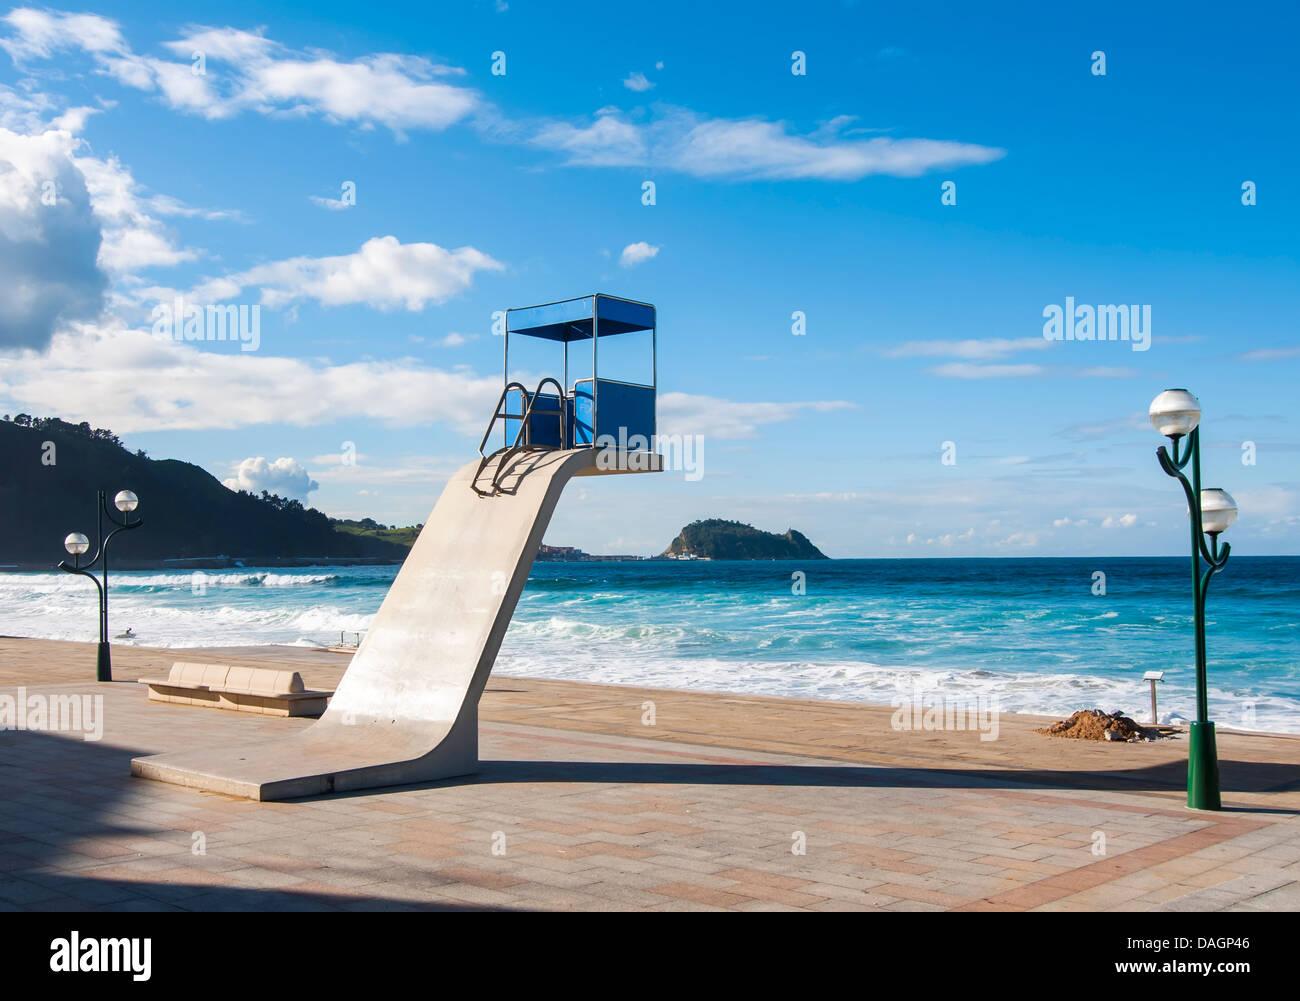 Boardwalk at the beach Zarautz in Vizcaya - Stock Image